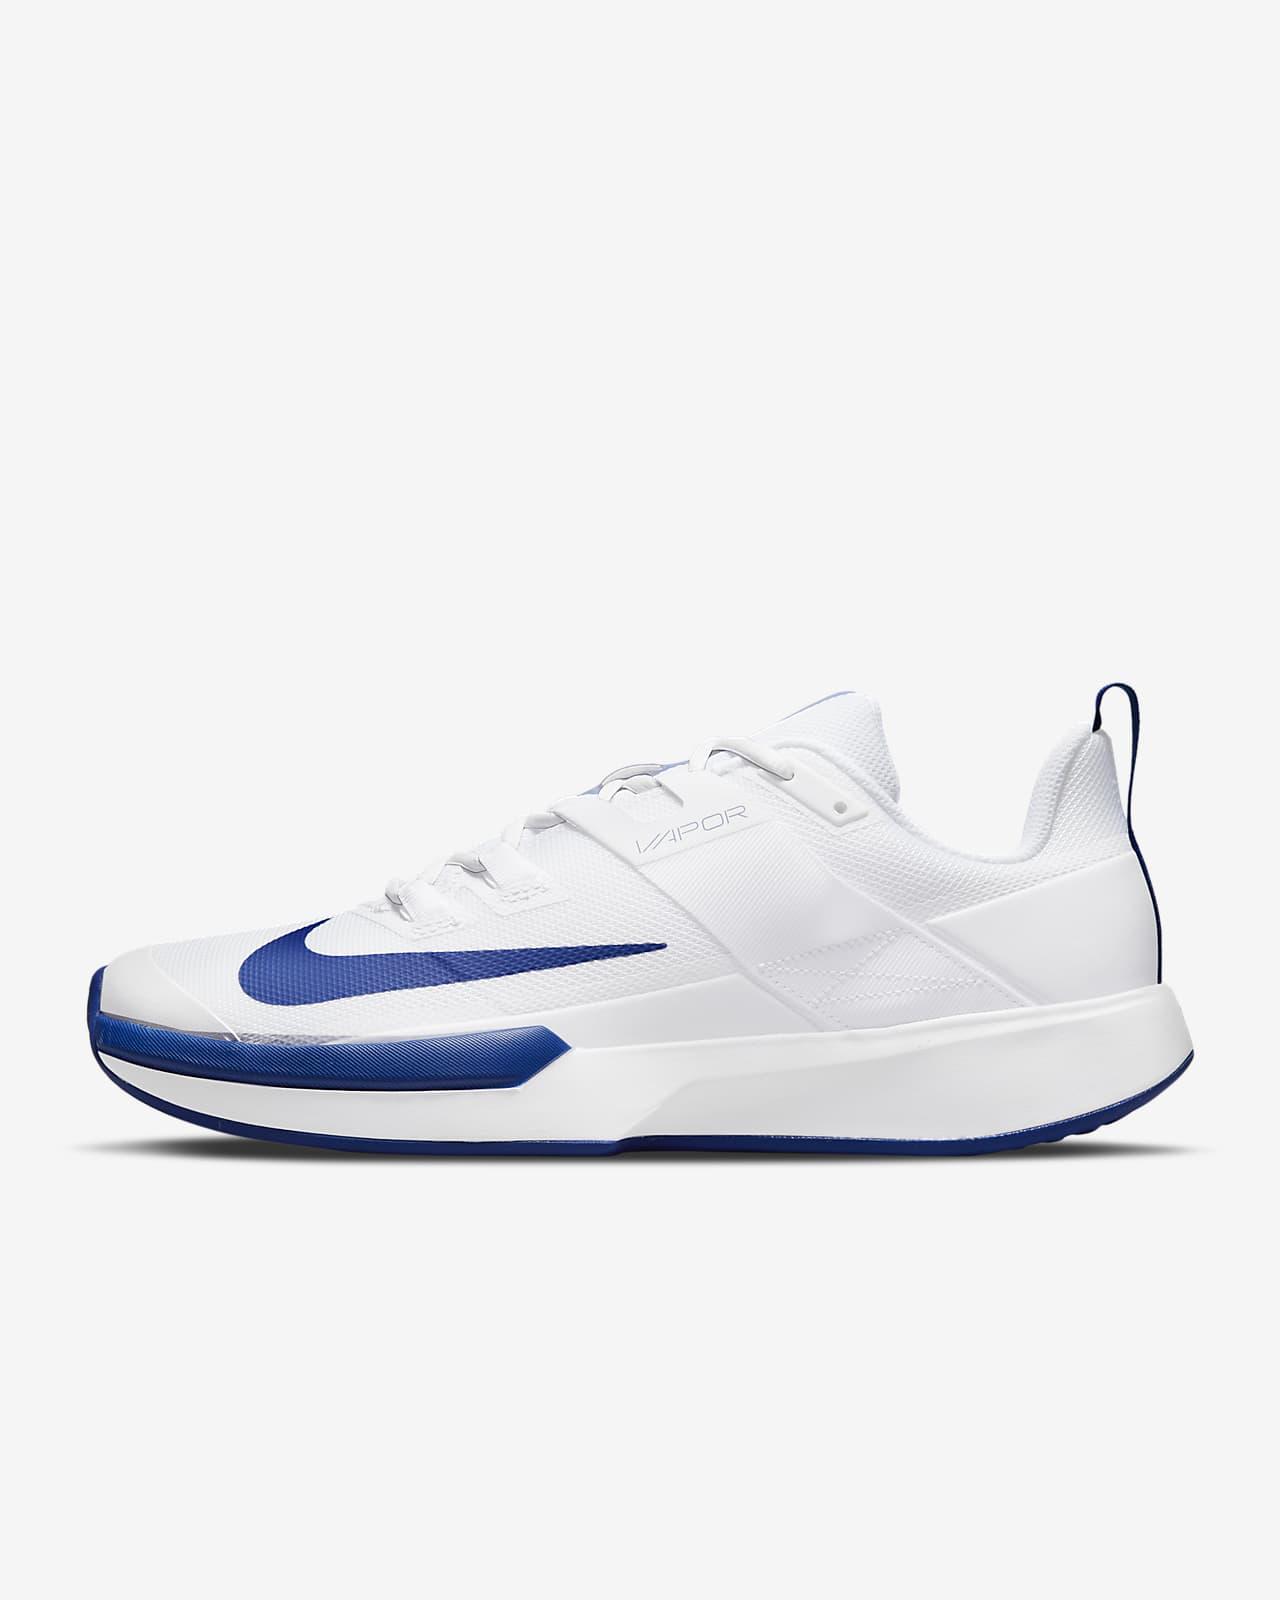 NikeCourt Vapor Lite Men's Hard Court Tennis Shoes